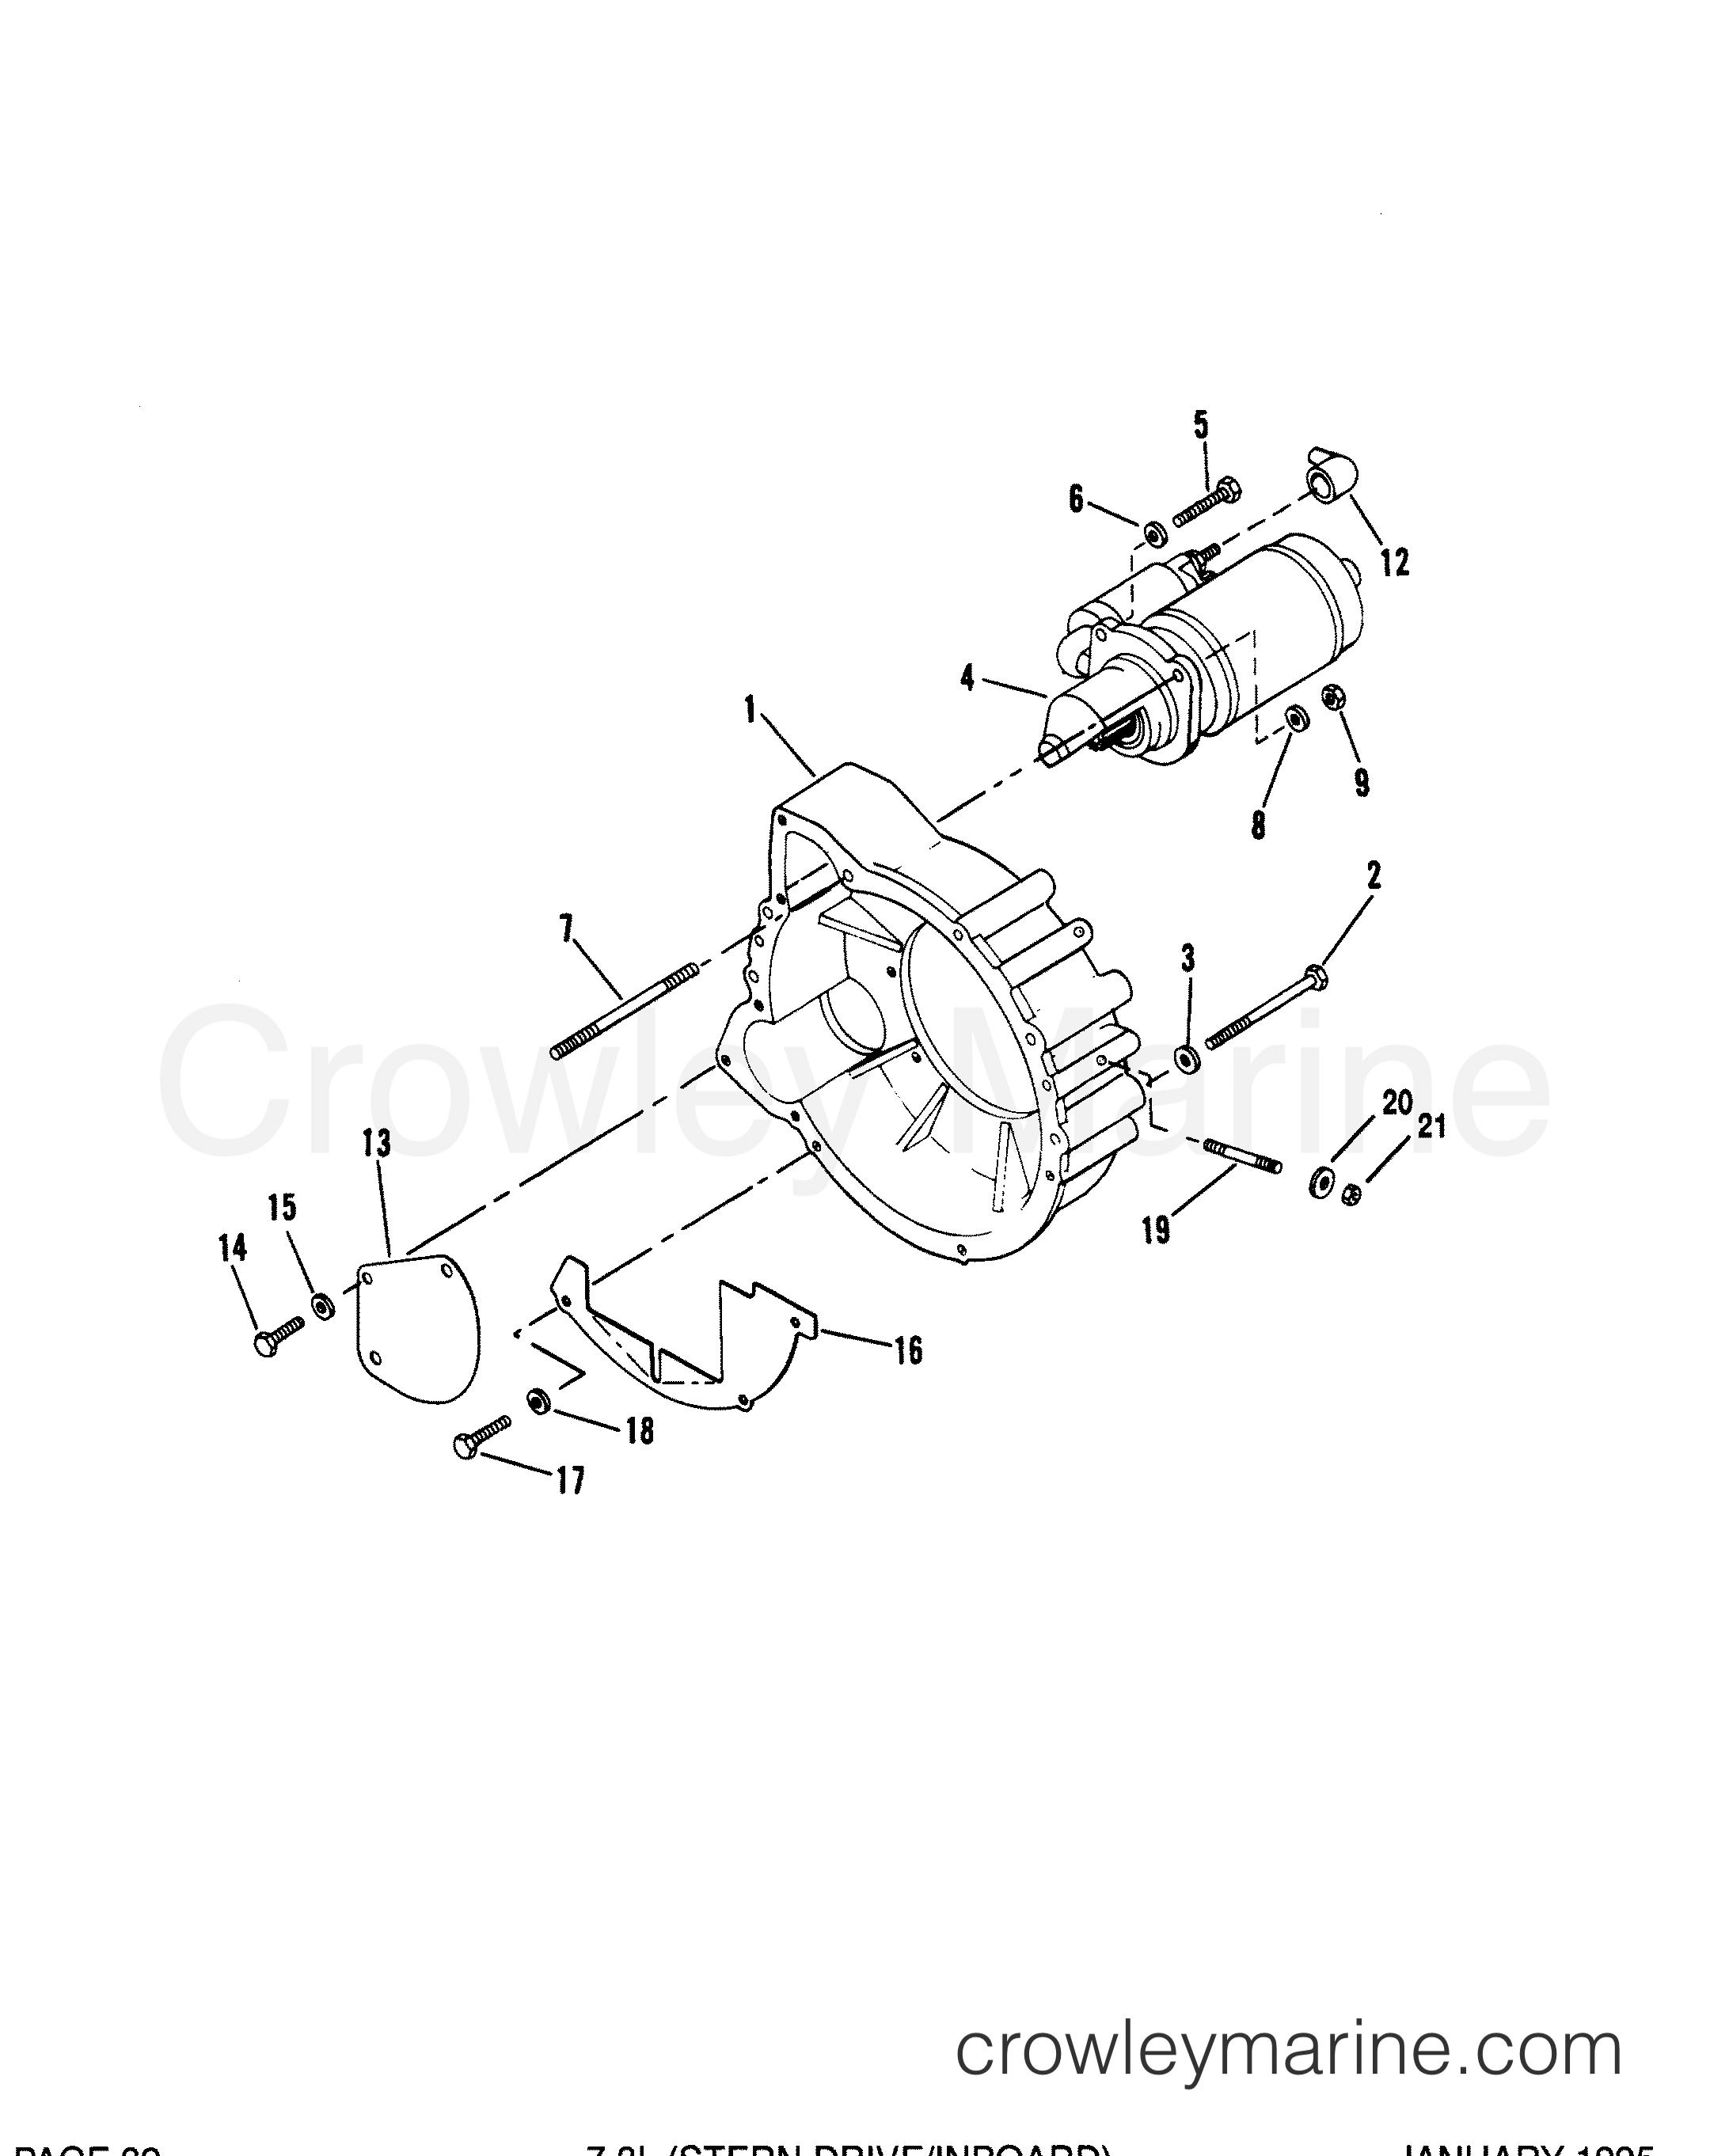 flywheel housing and starter motor  inboard